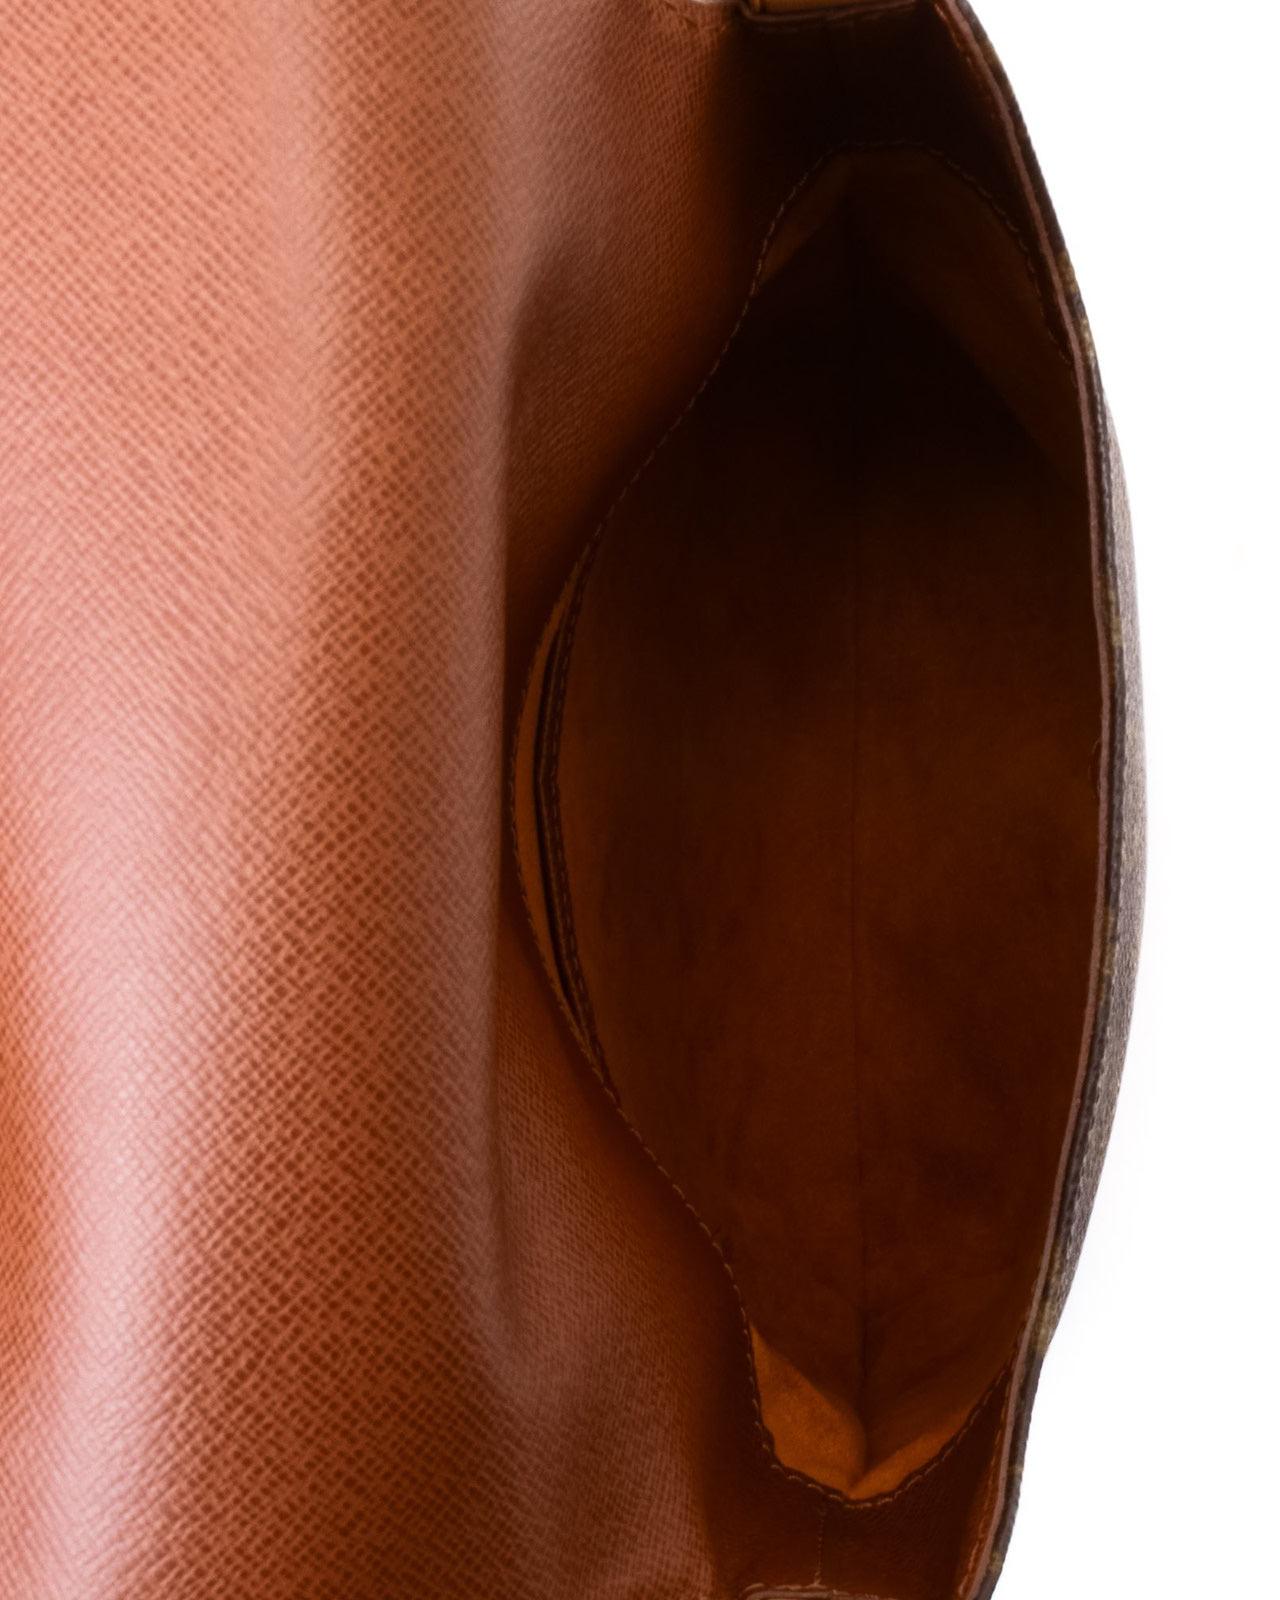 Louis vuitton Musette Salsa Short Strap Shoulder Bag in Brown | Lyst